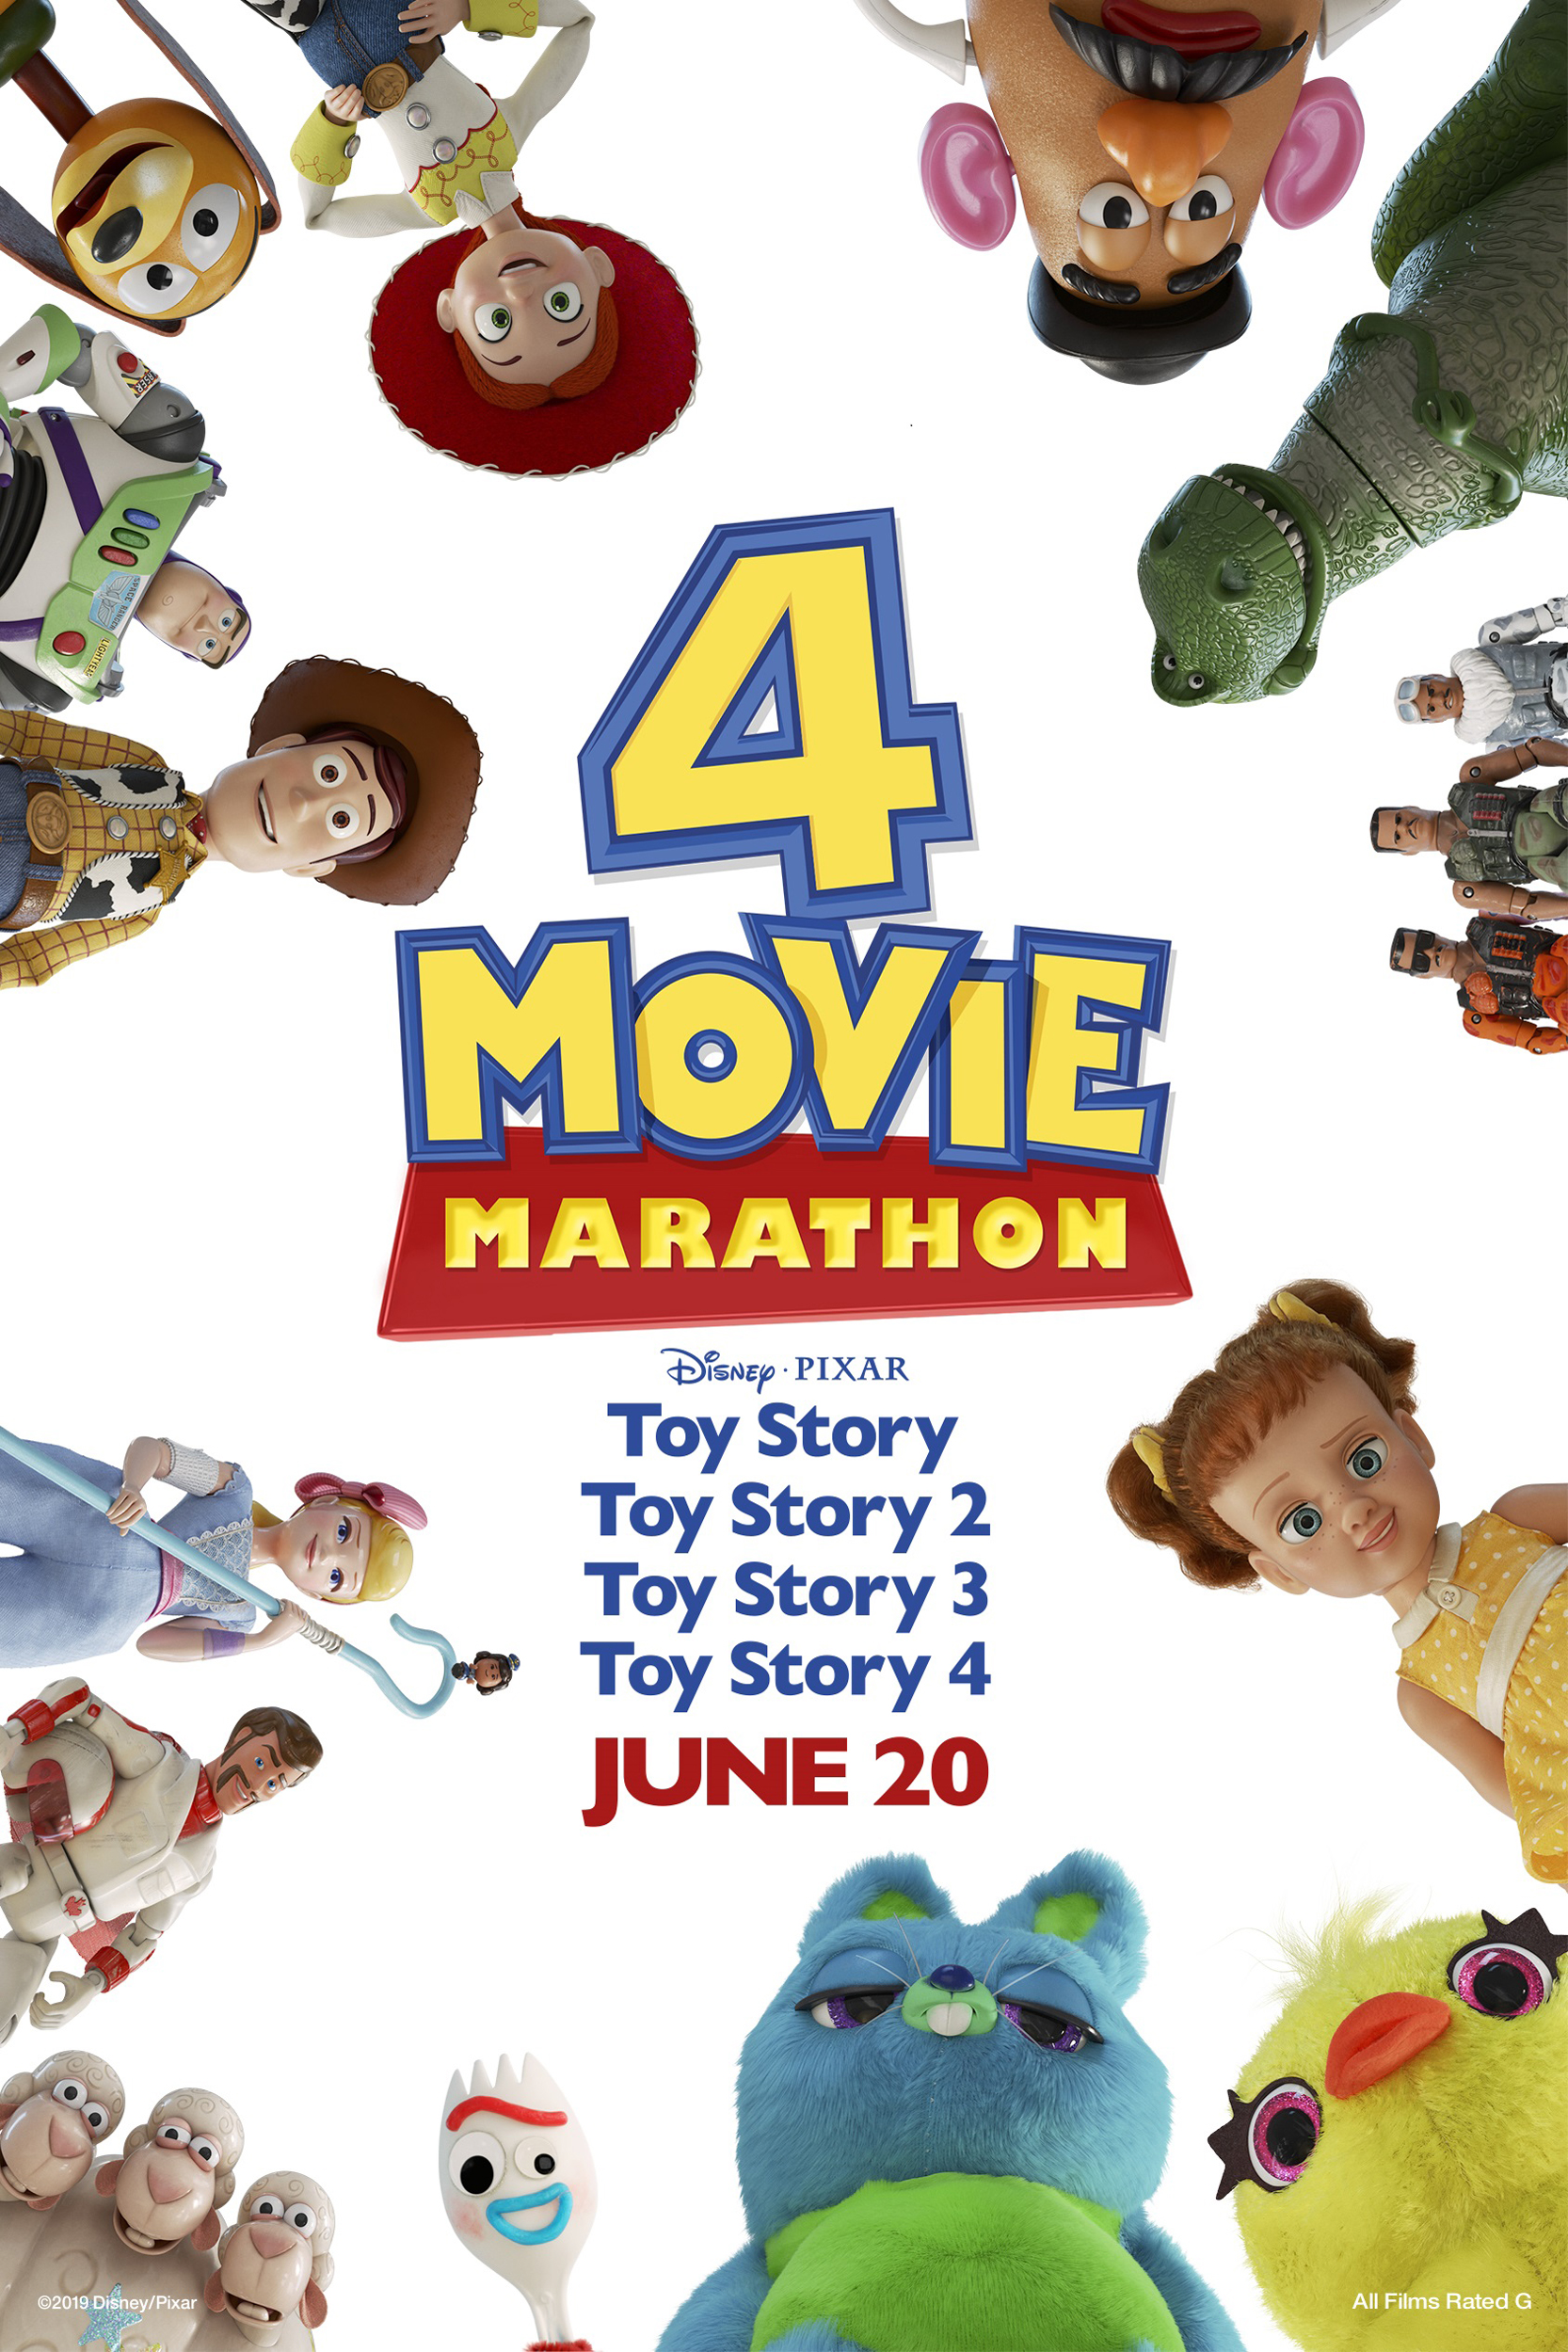 Toy Story 4 Movie Marathon Movie Times   Showcase Cinema ...